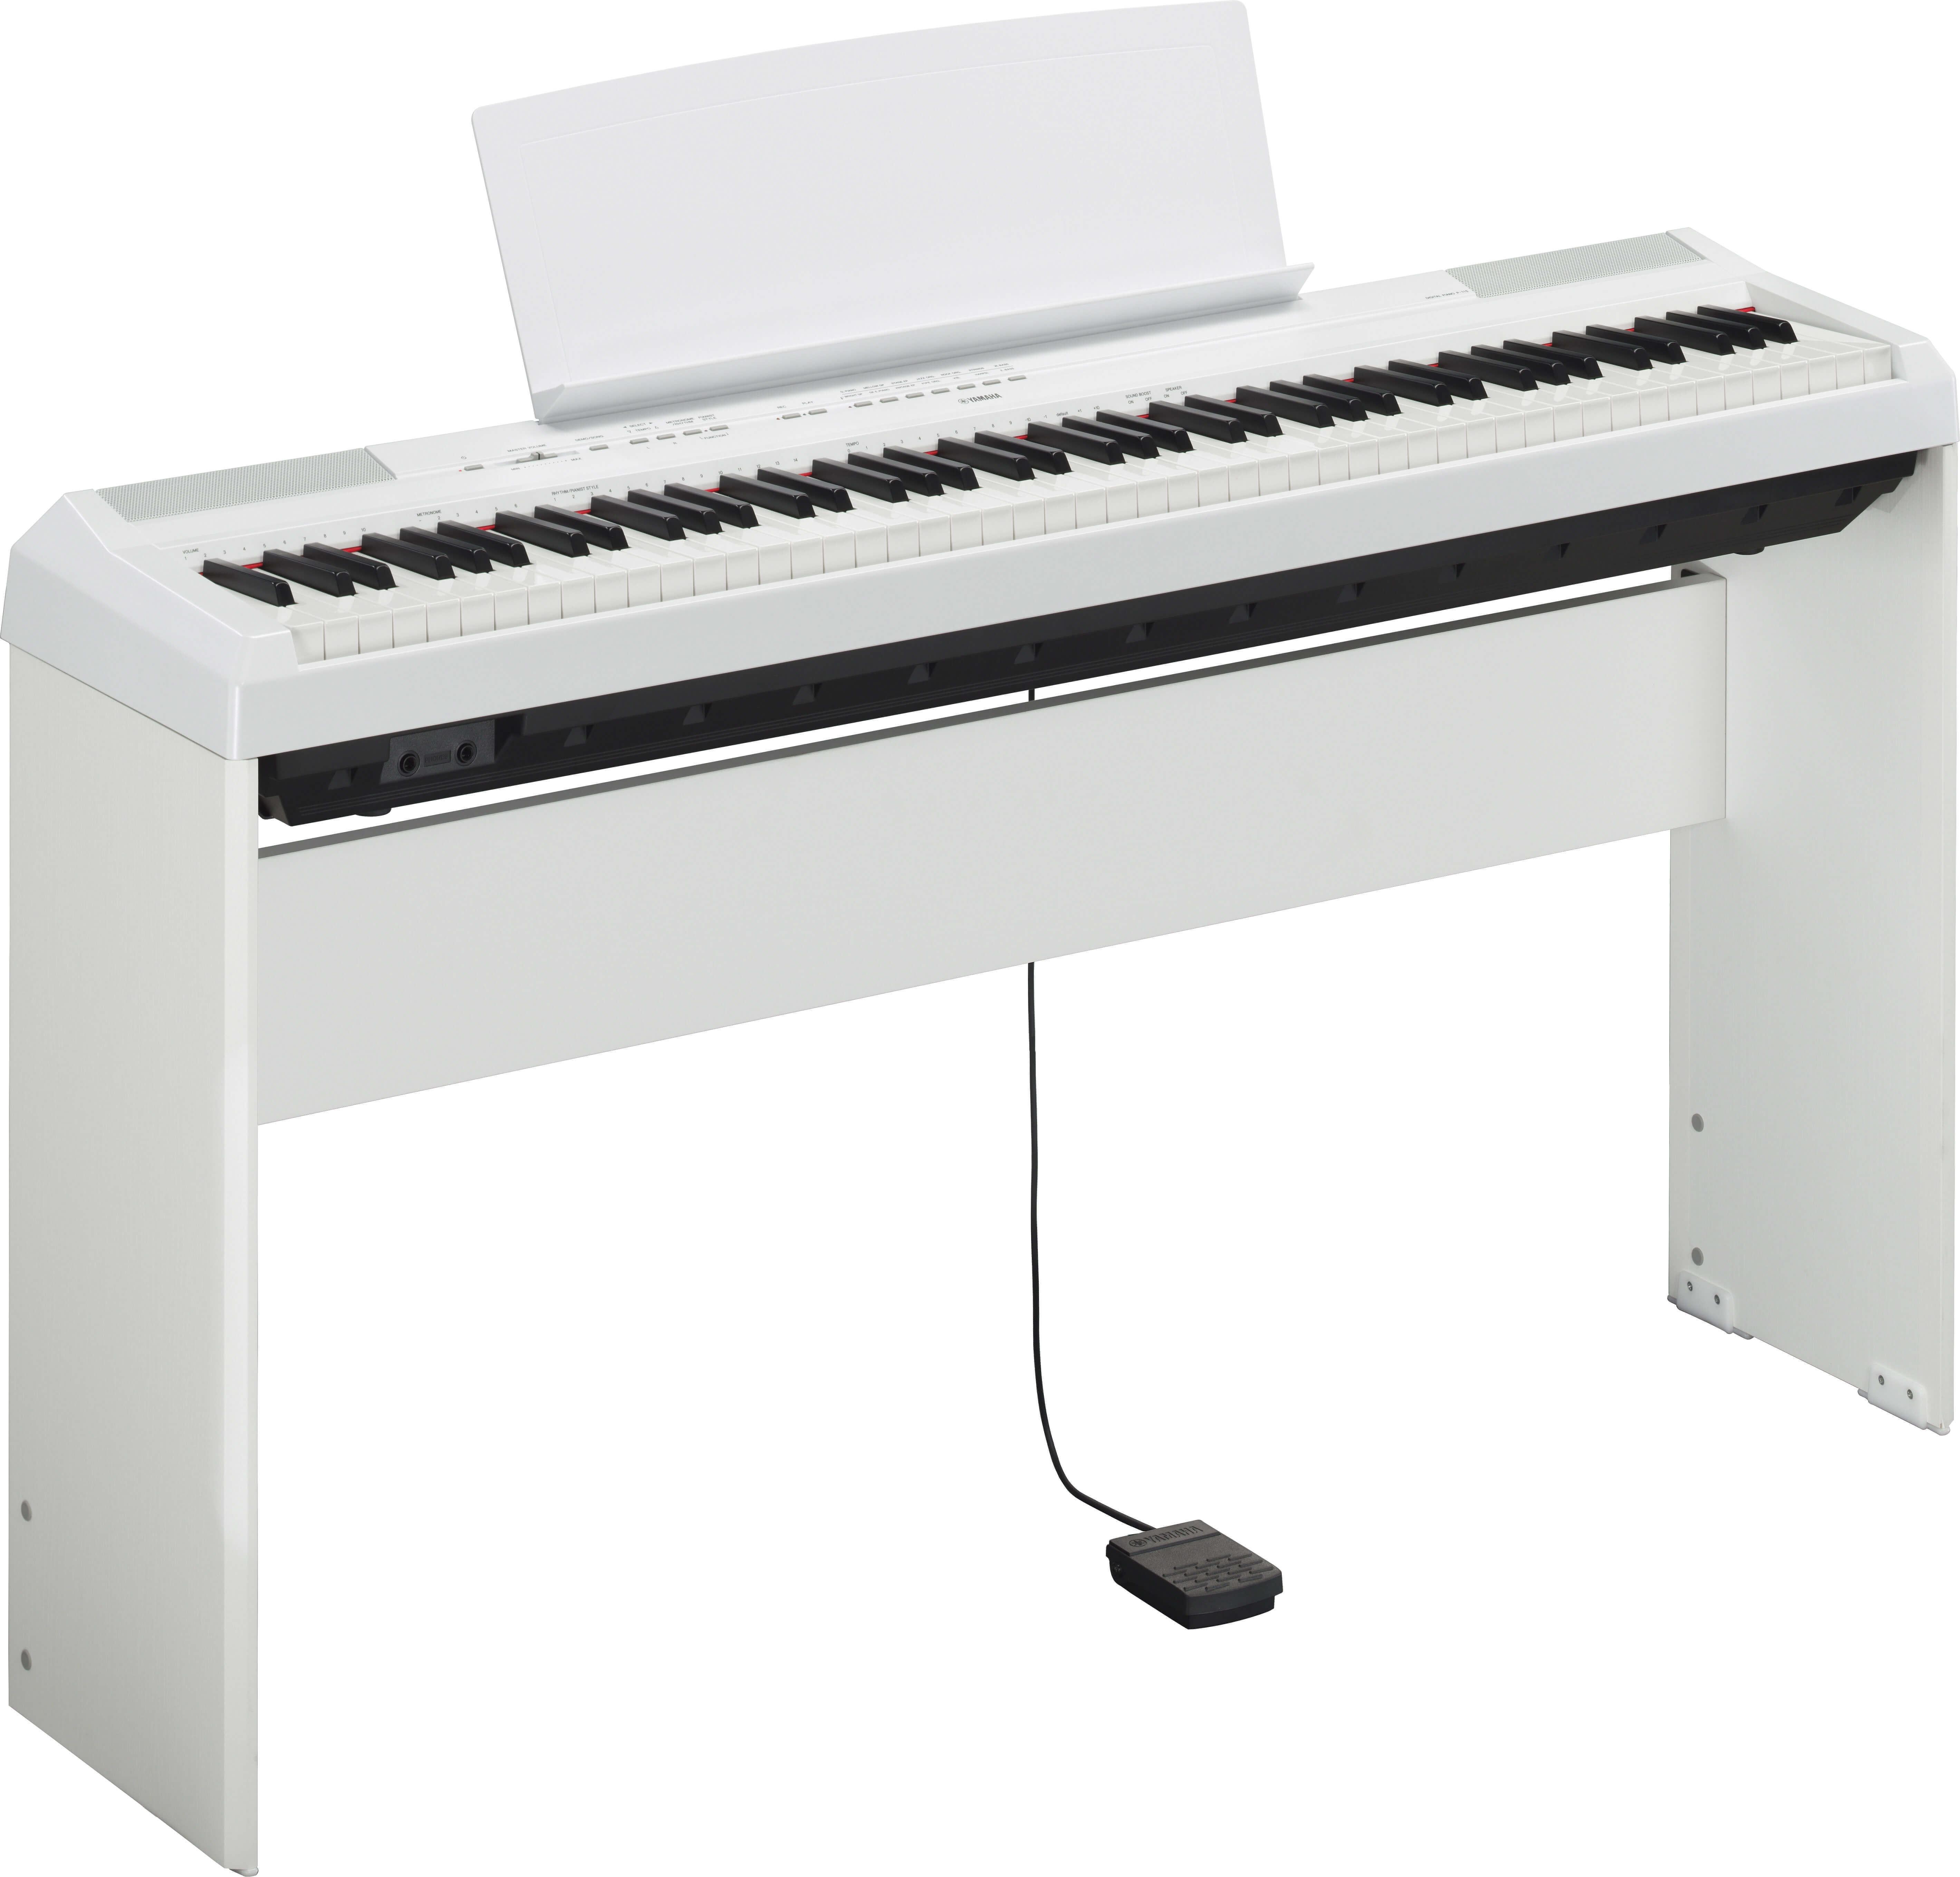 雅马哈 Yamaha P115 电钢琴 88键